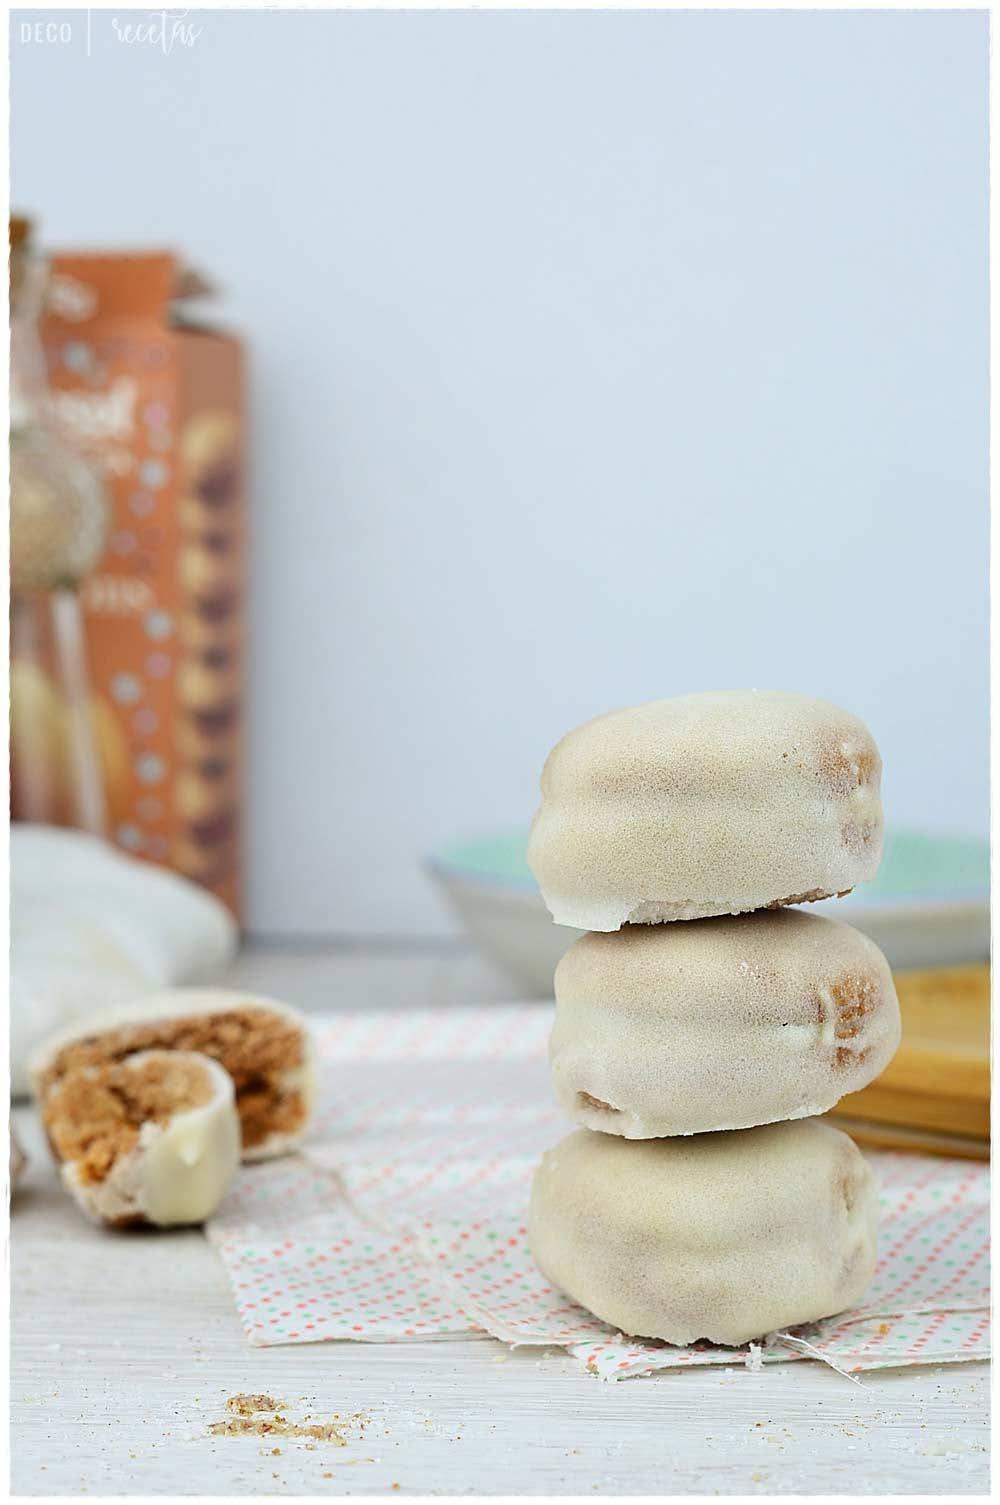 glaseado real glasa glaseados para galletas receta glasa real